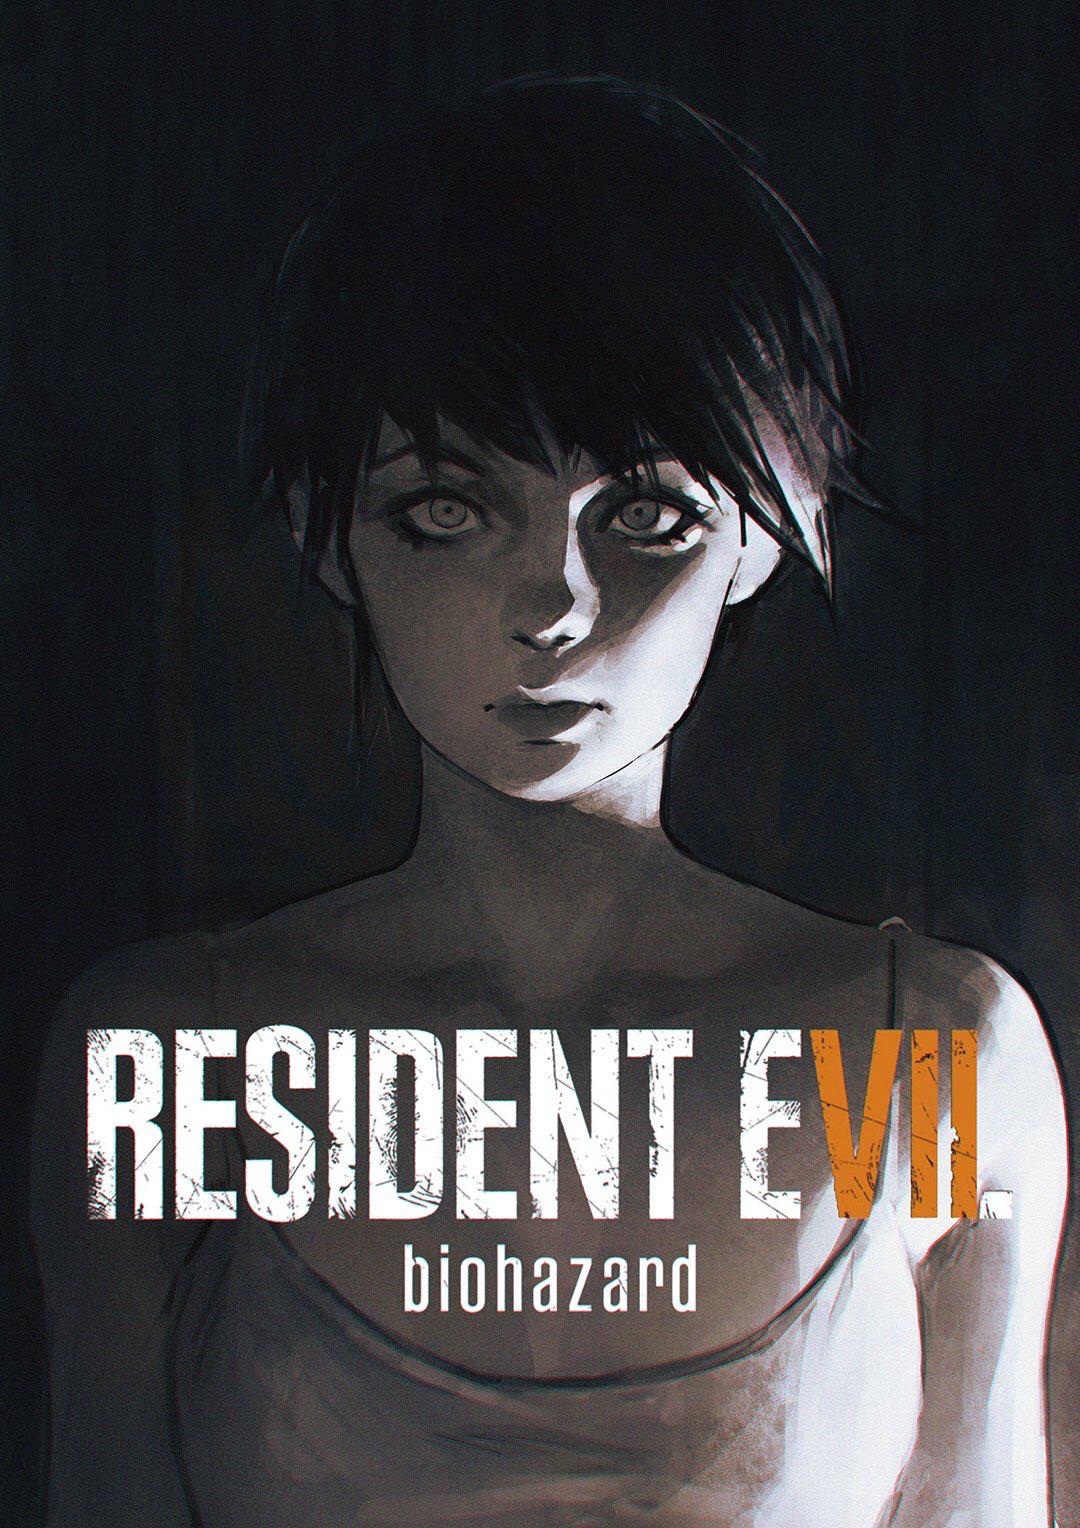 Pin By Ali Orangefox On What A Mansion Re Fan Stuff 3 Resident Evil Girl Resident Evil Resident Evil 7 Biohazard